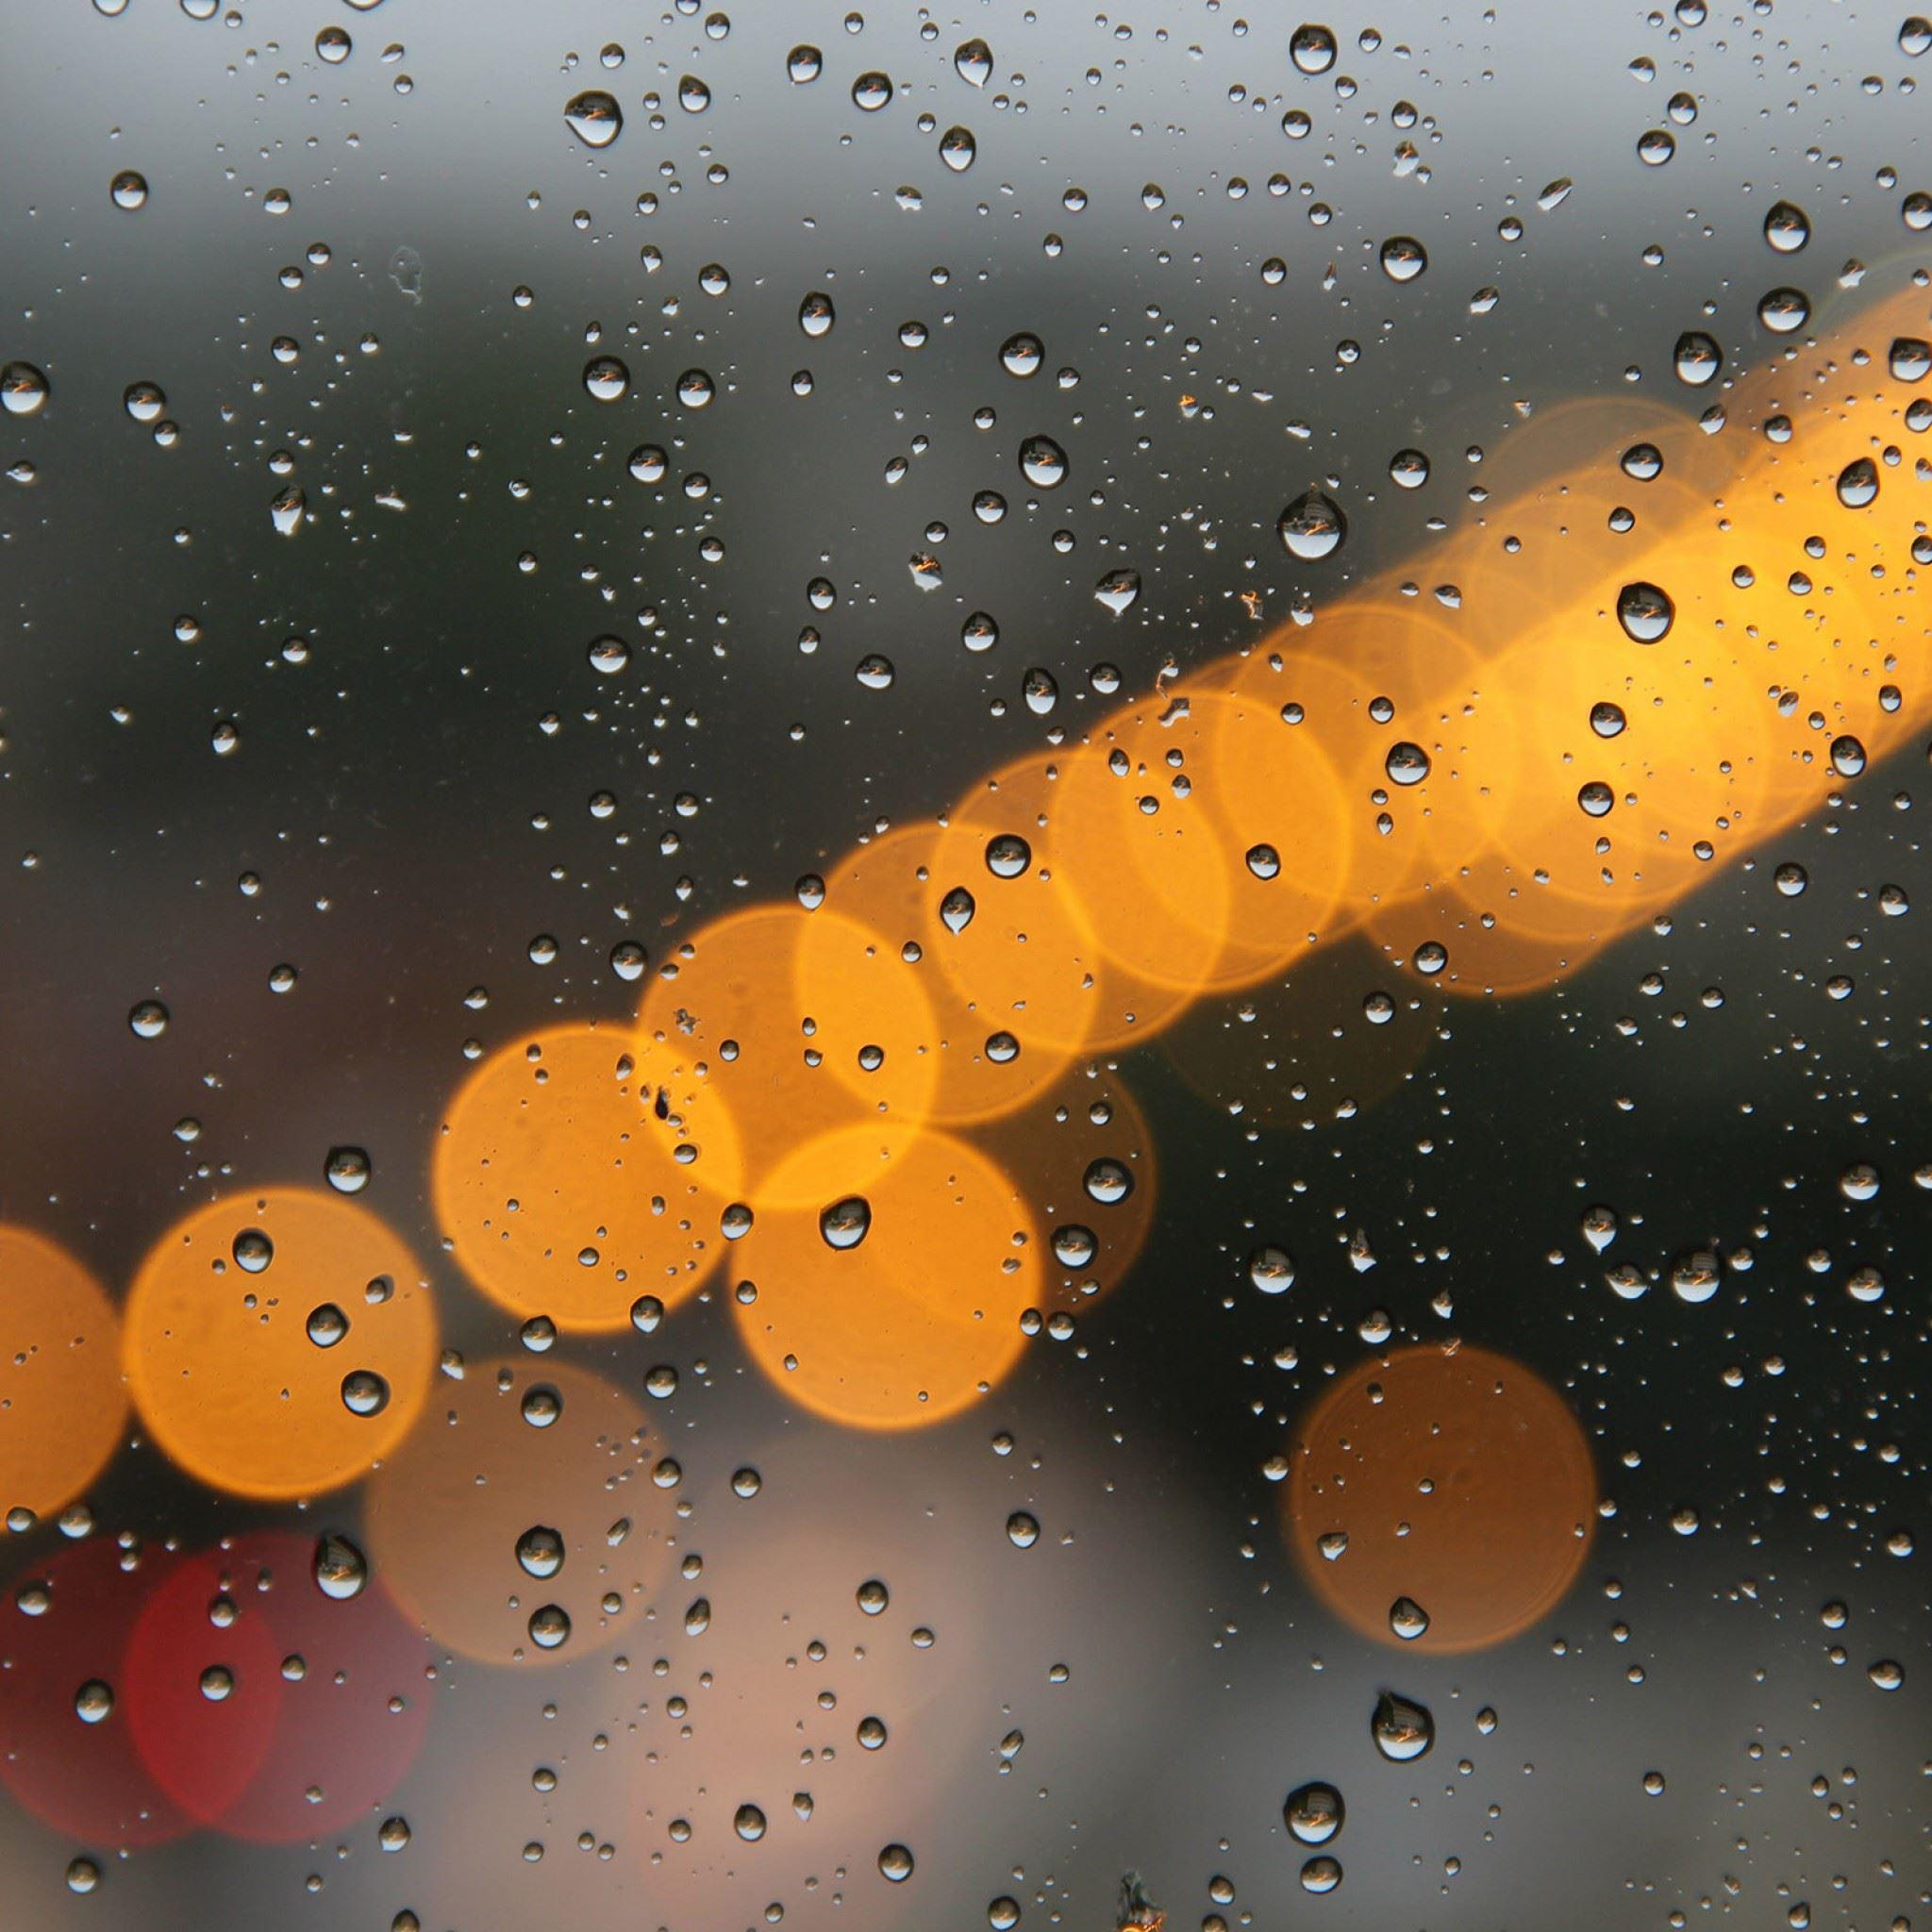 Light Rainwater Night Ipad Air Wallpapers Free Download